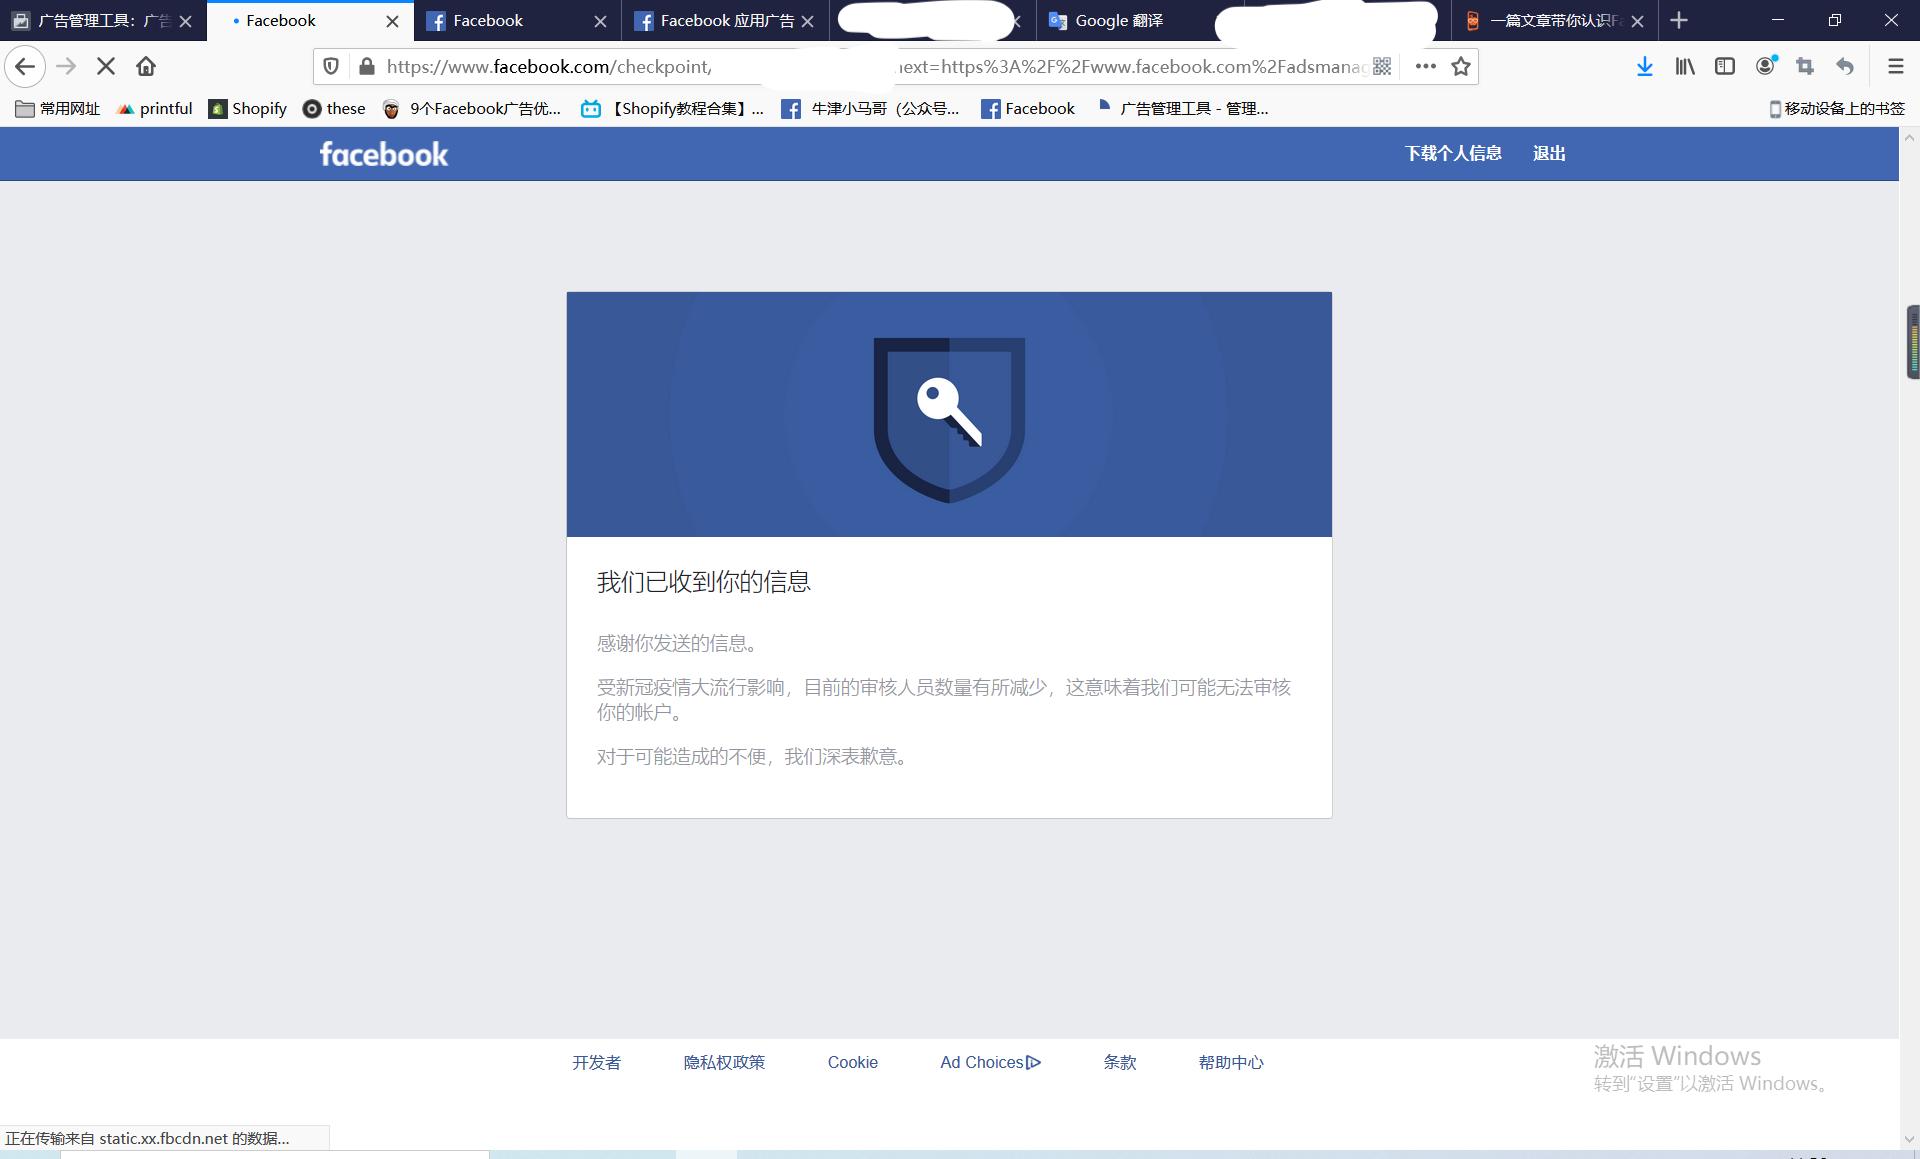 facebook提交了复核审核信息